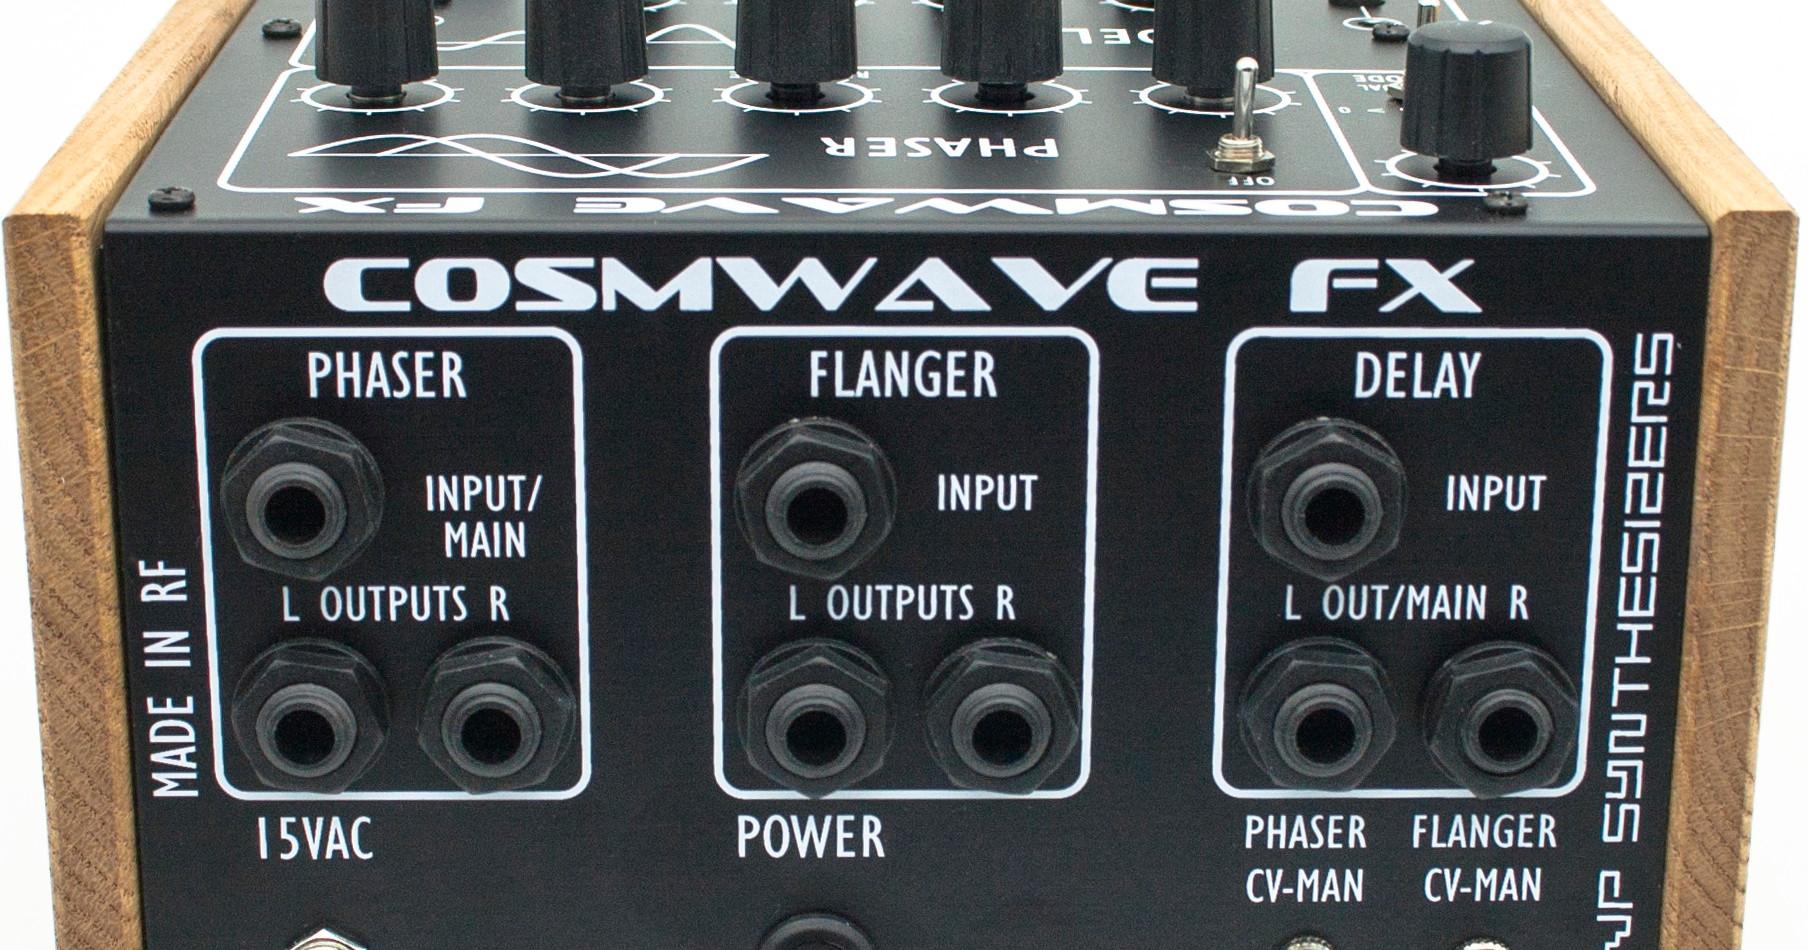 AVP Synth Cosmwave FX back.jpeg